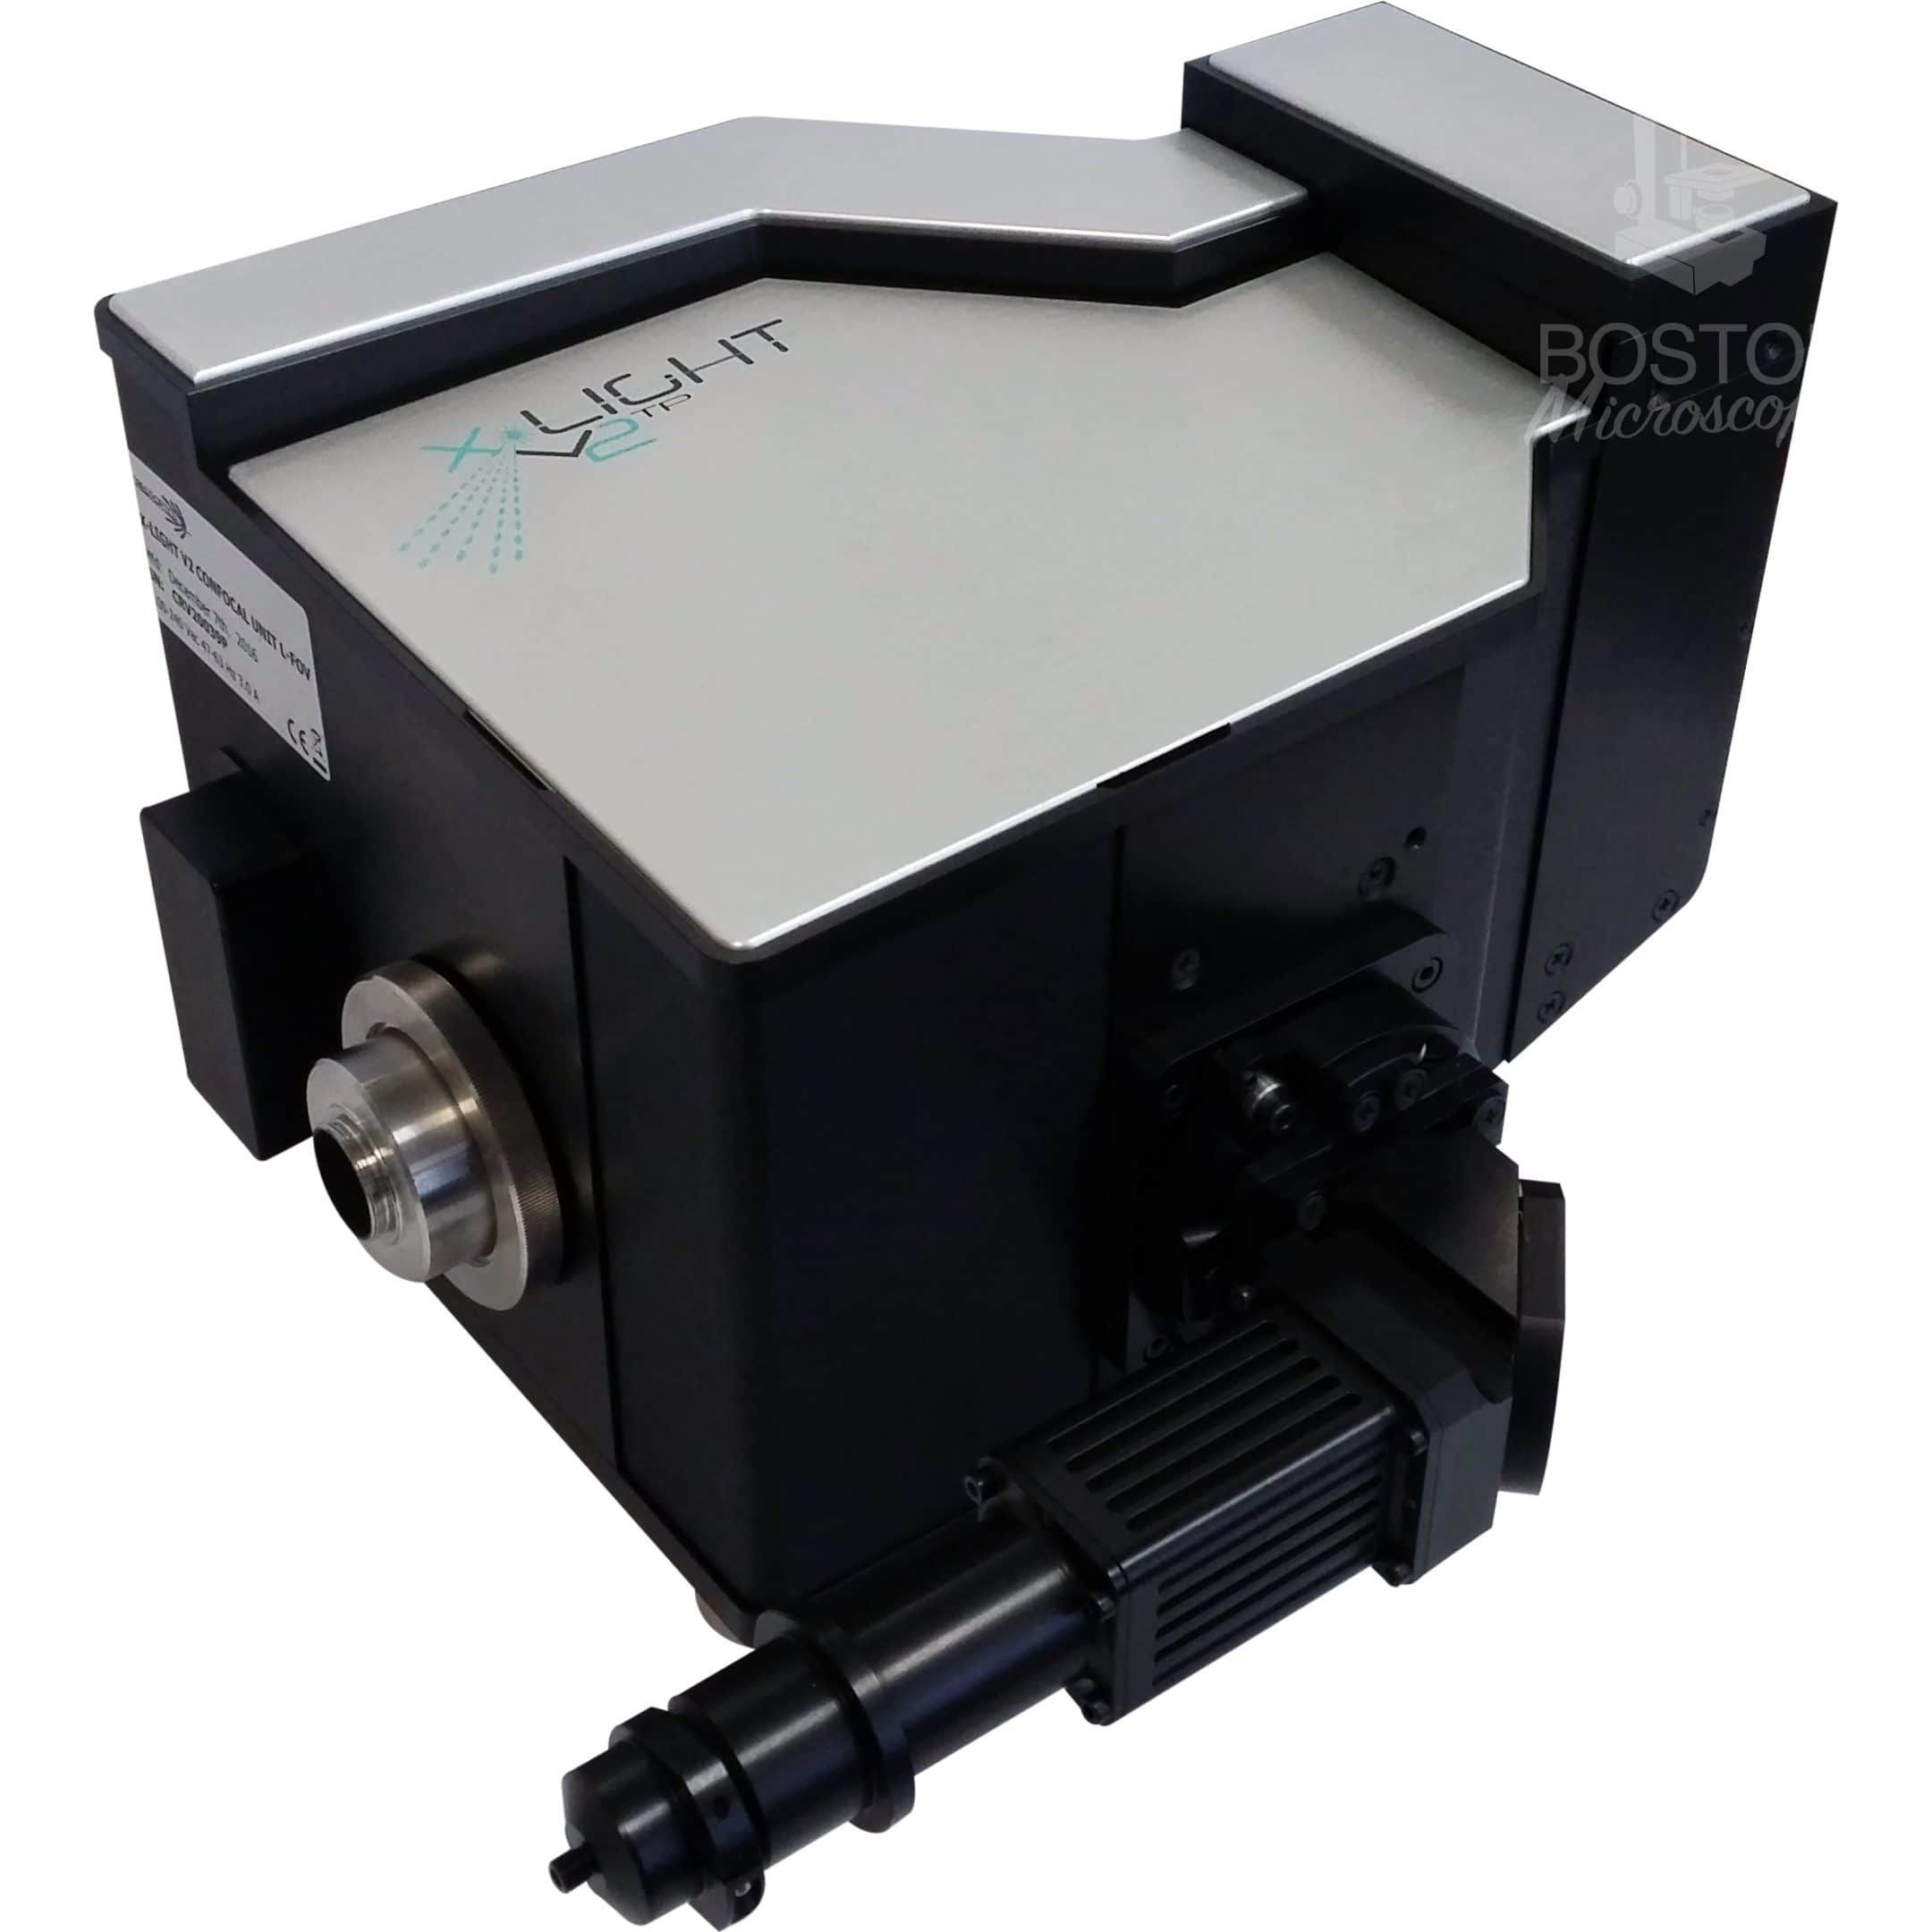 89 North X-Light V2 Spinning Disk Confocal